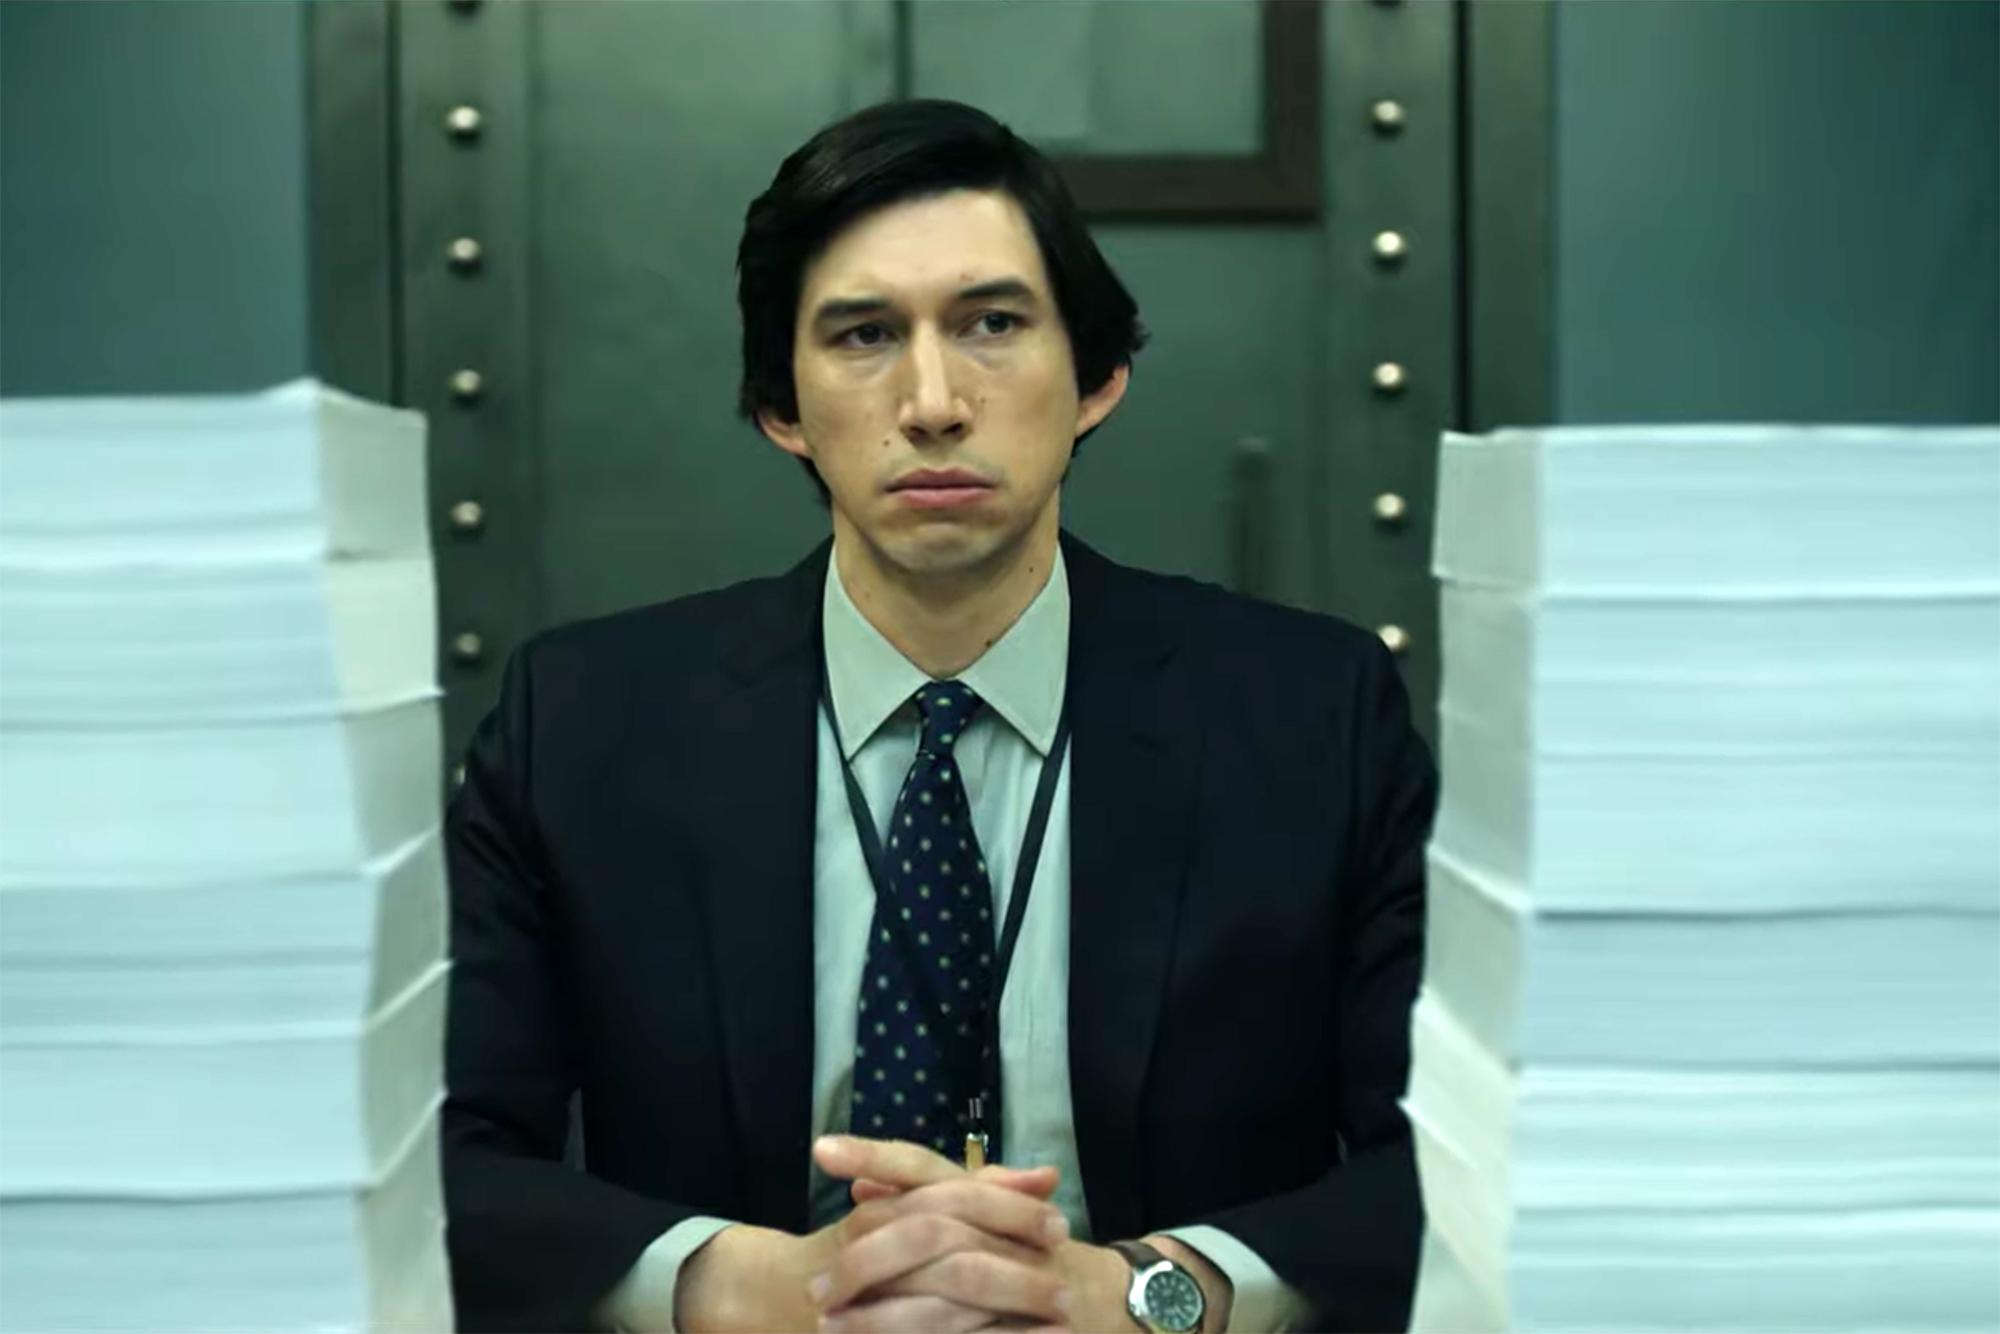 Watch Adam Driver Expose CIA Torture in 'The Report' Trailer